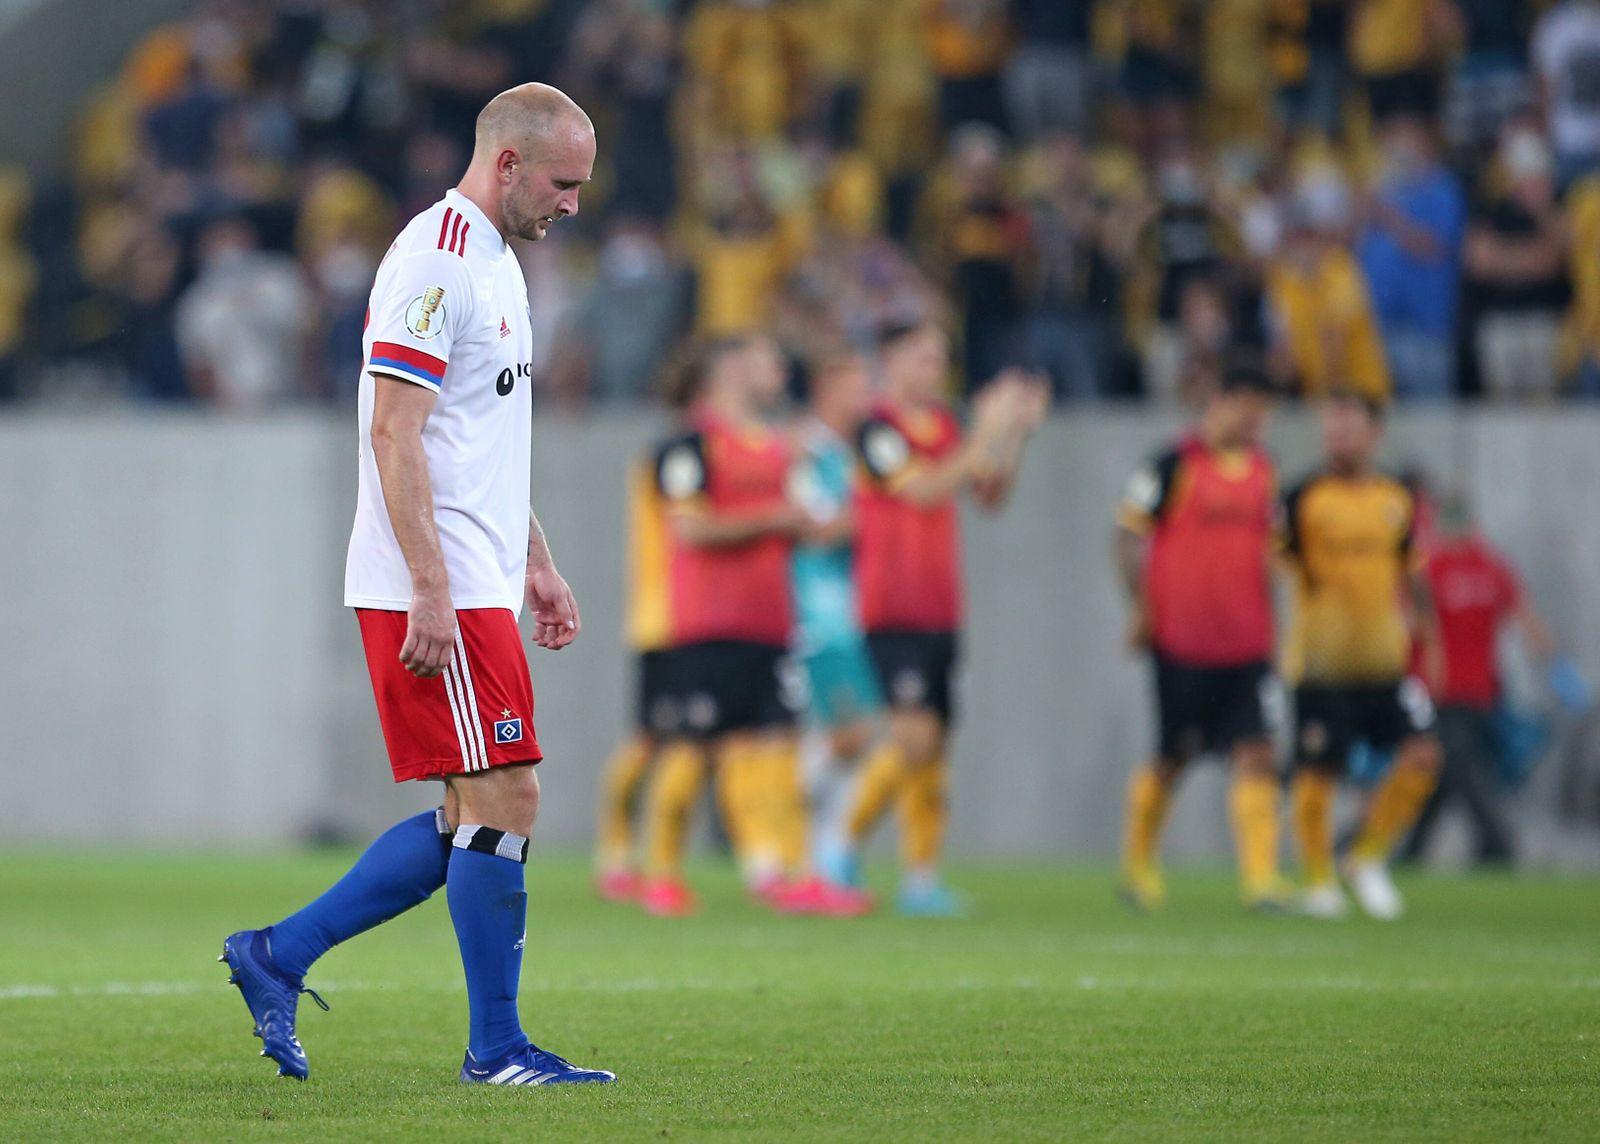 14.09.2020, Fussball DFB Pokal 2020/2021, 1. Runde, SG Dynamo Dresden - Hamburger SV, im Rudolf-Harbig-Stadion Dresden.